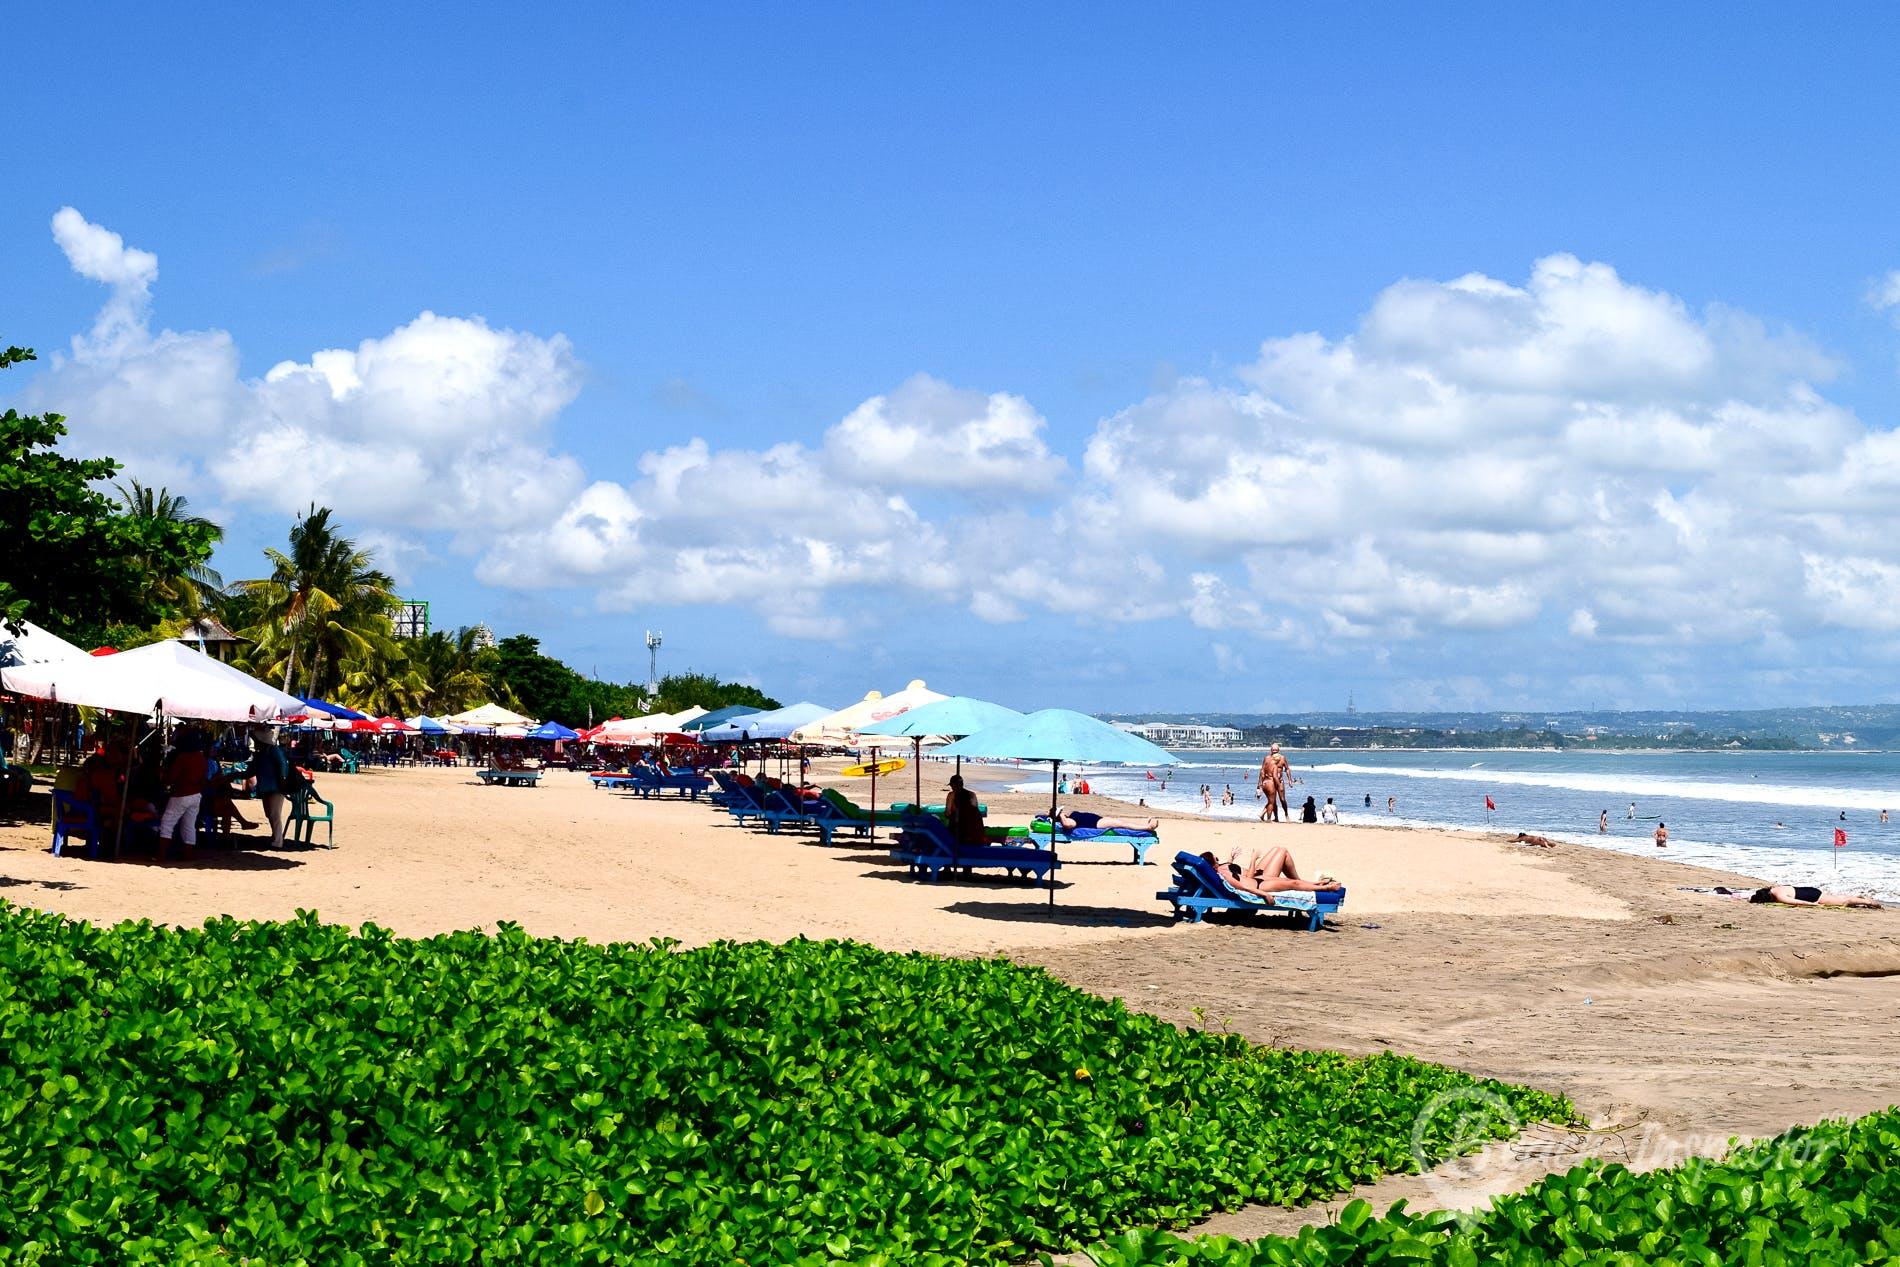 Beach Legian Beach, Bali, Indonesia